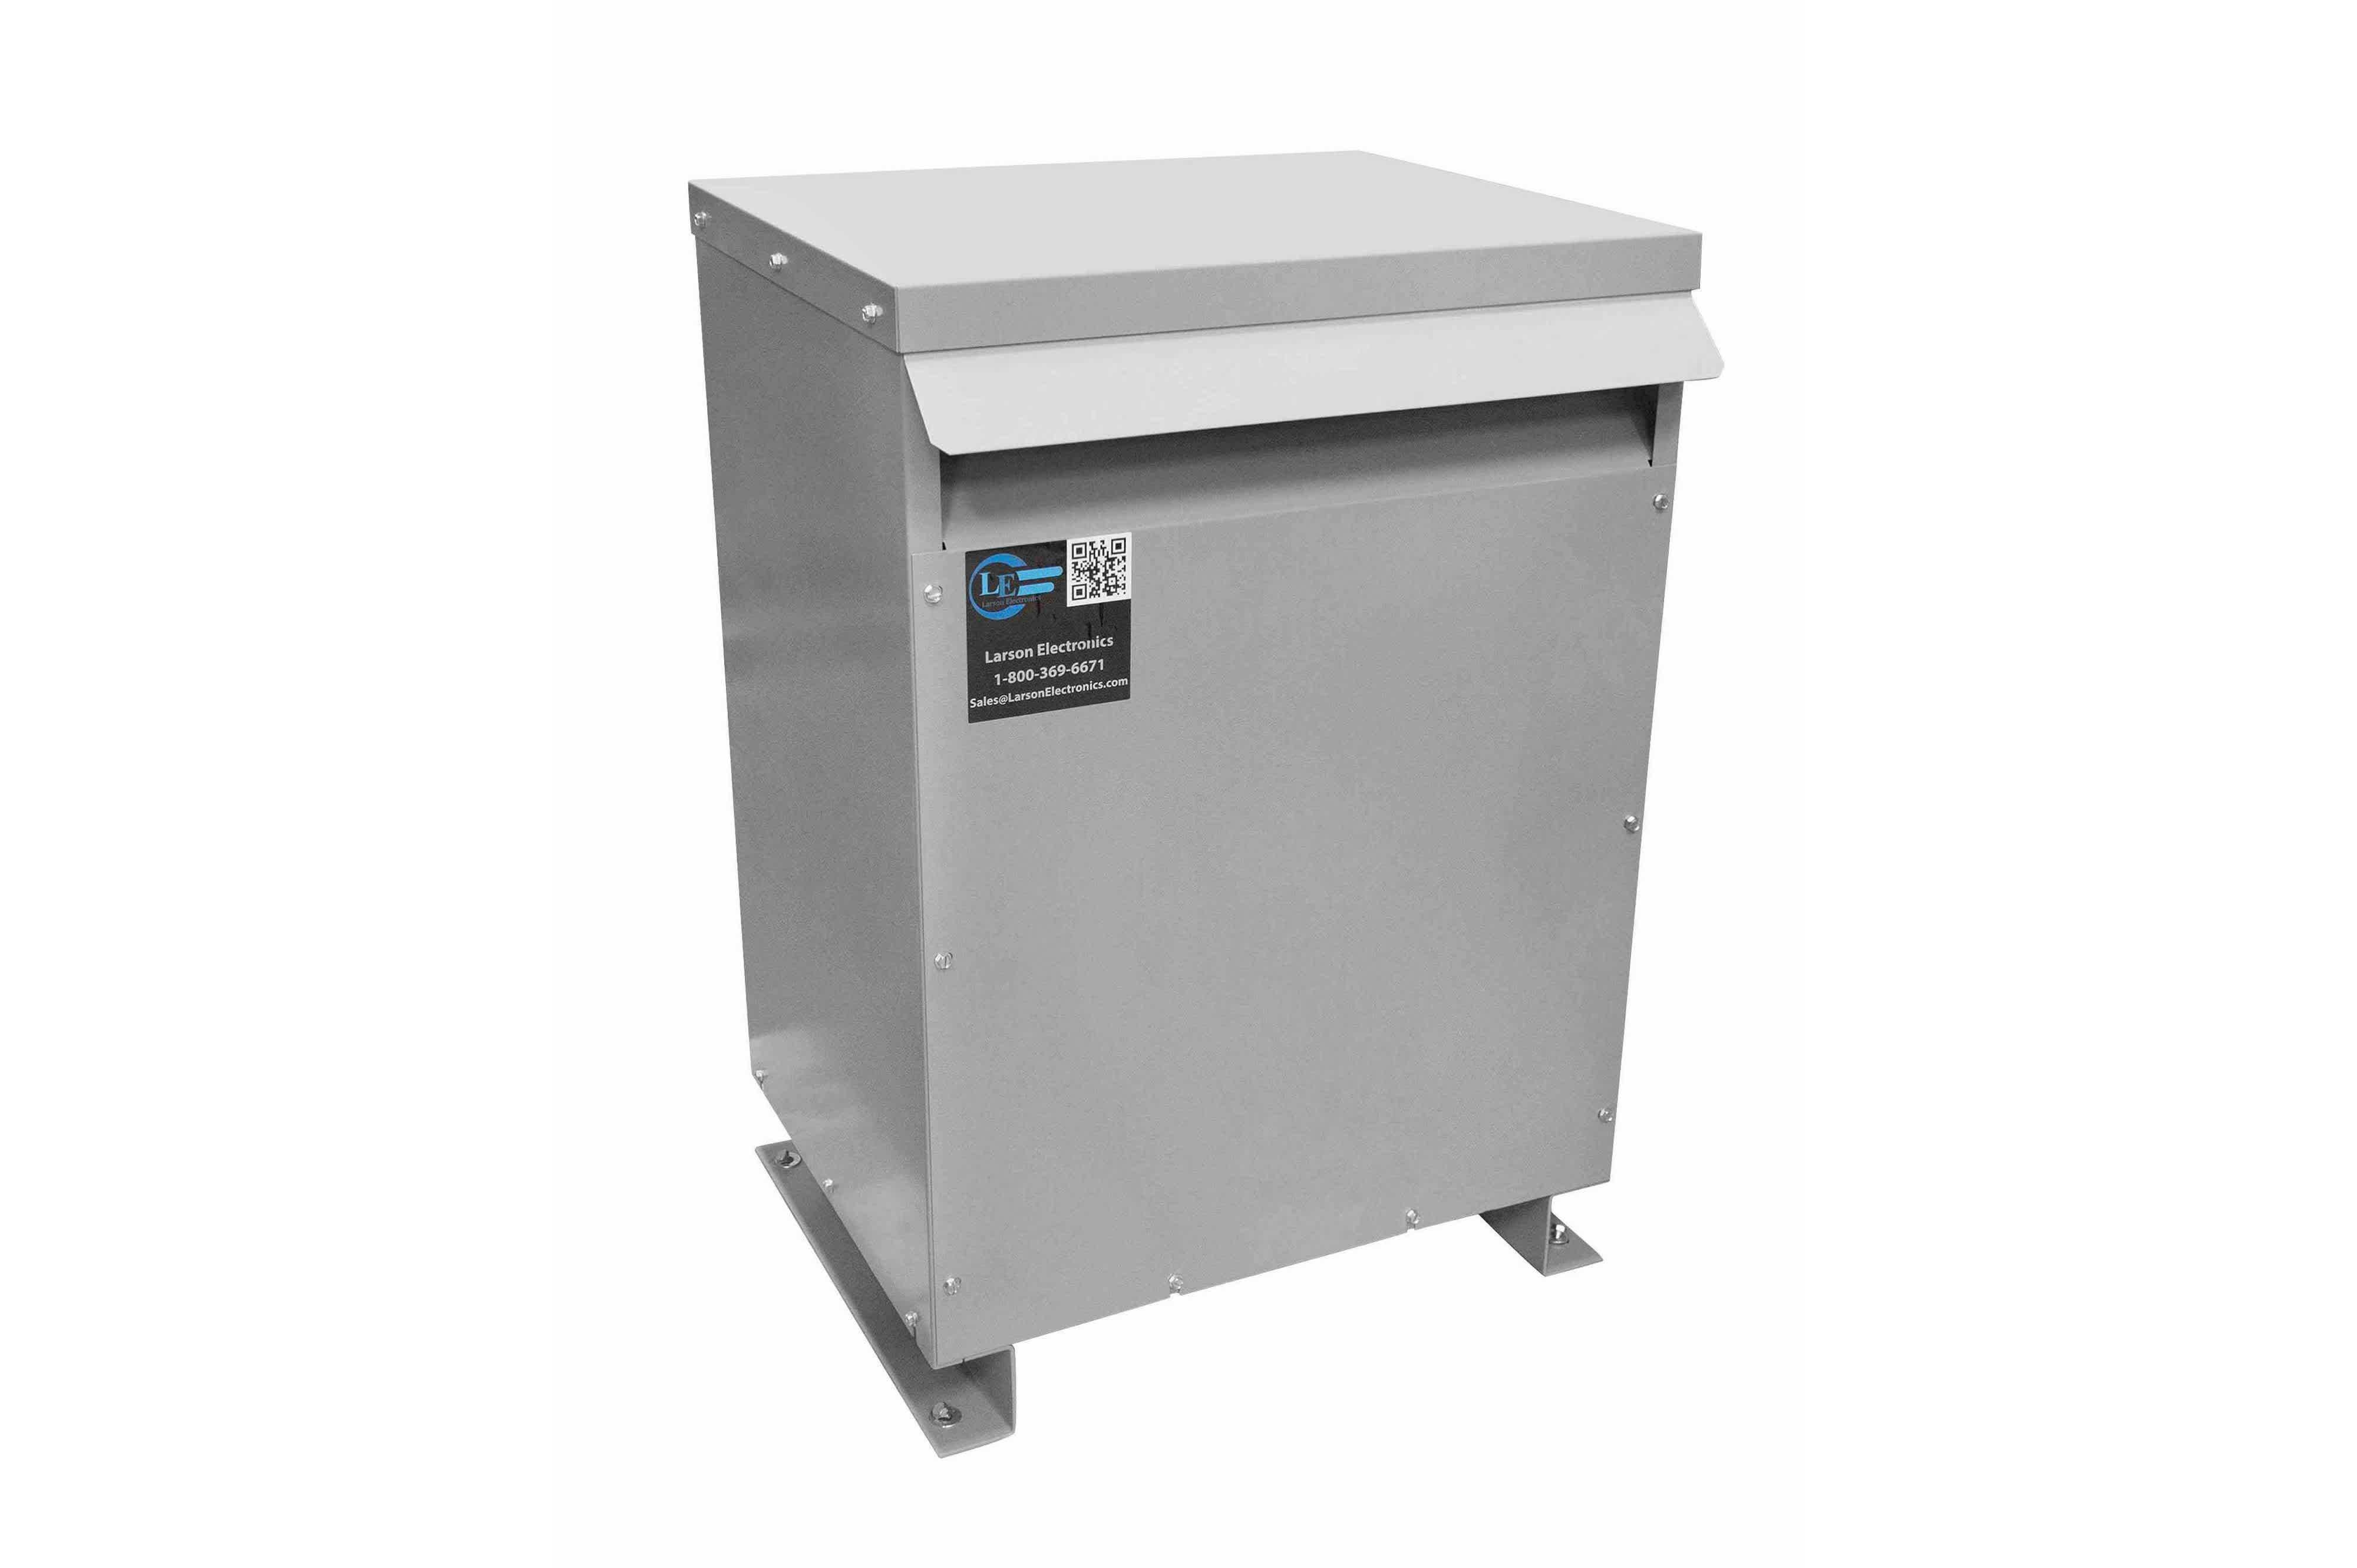 700 kVA 3PH Isolation Transformer, 220V Wye Primary, 480V Delta Secondary, N3R, Ventilated, 60 Hz